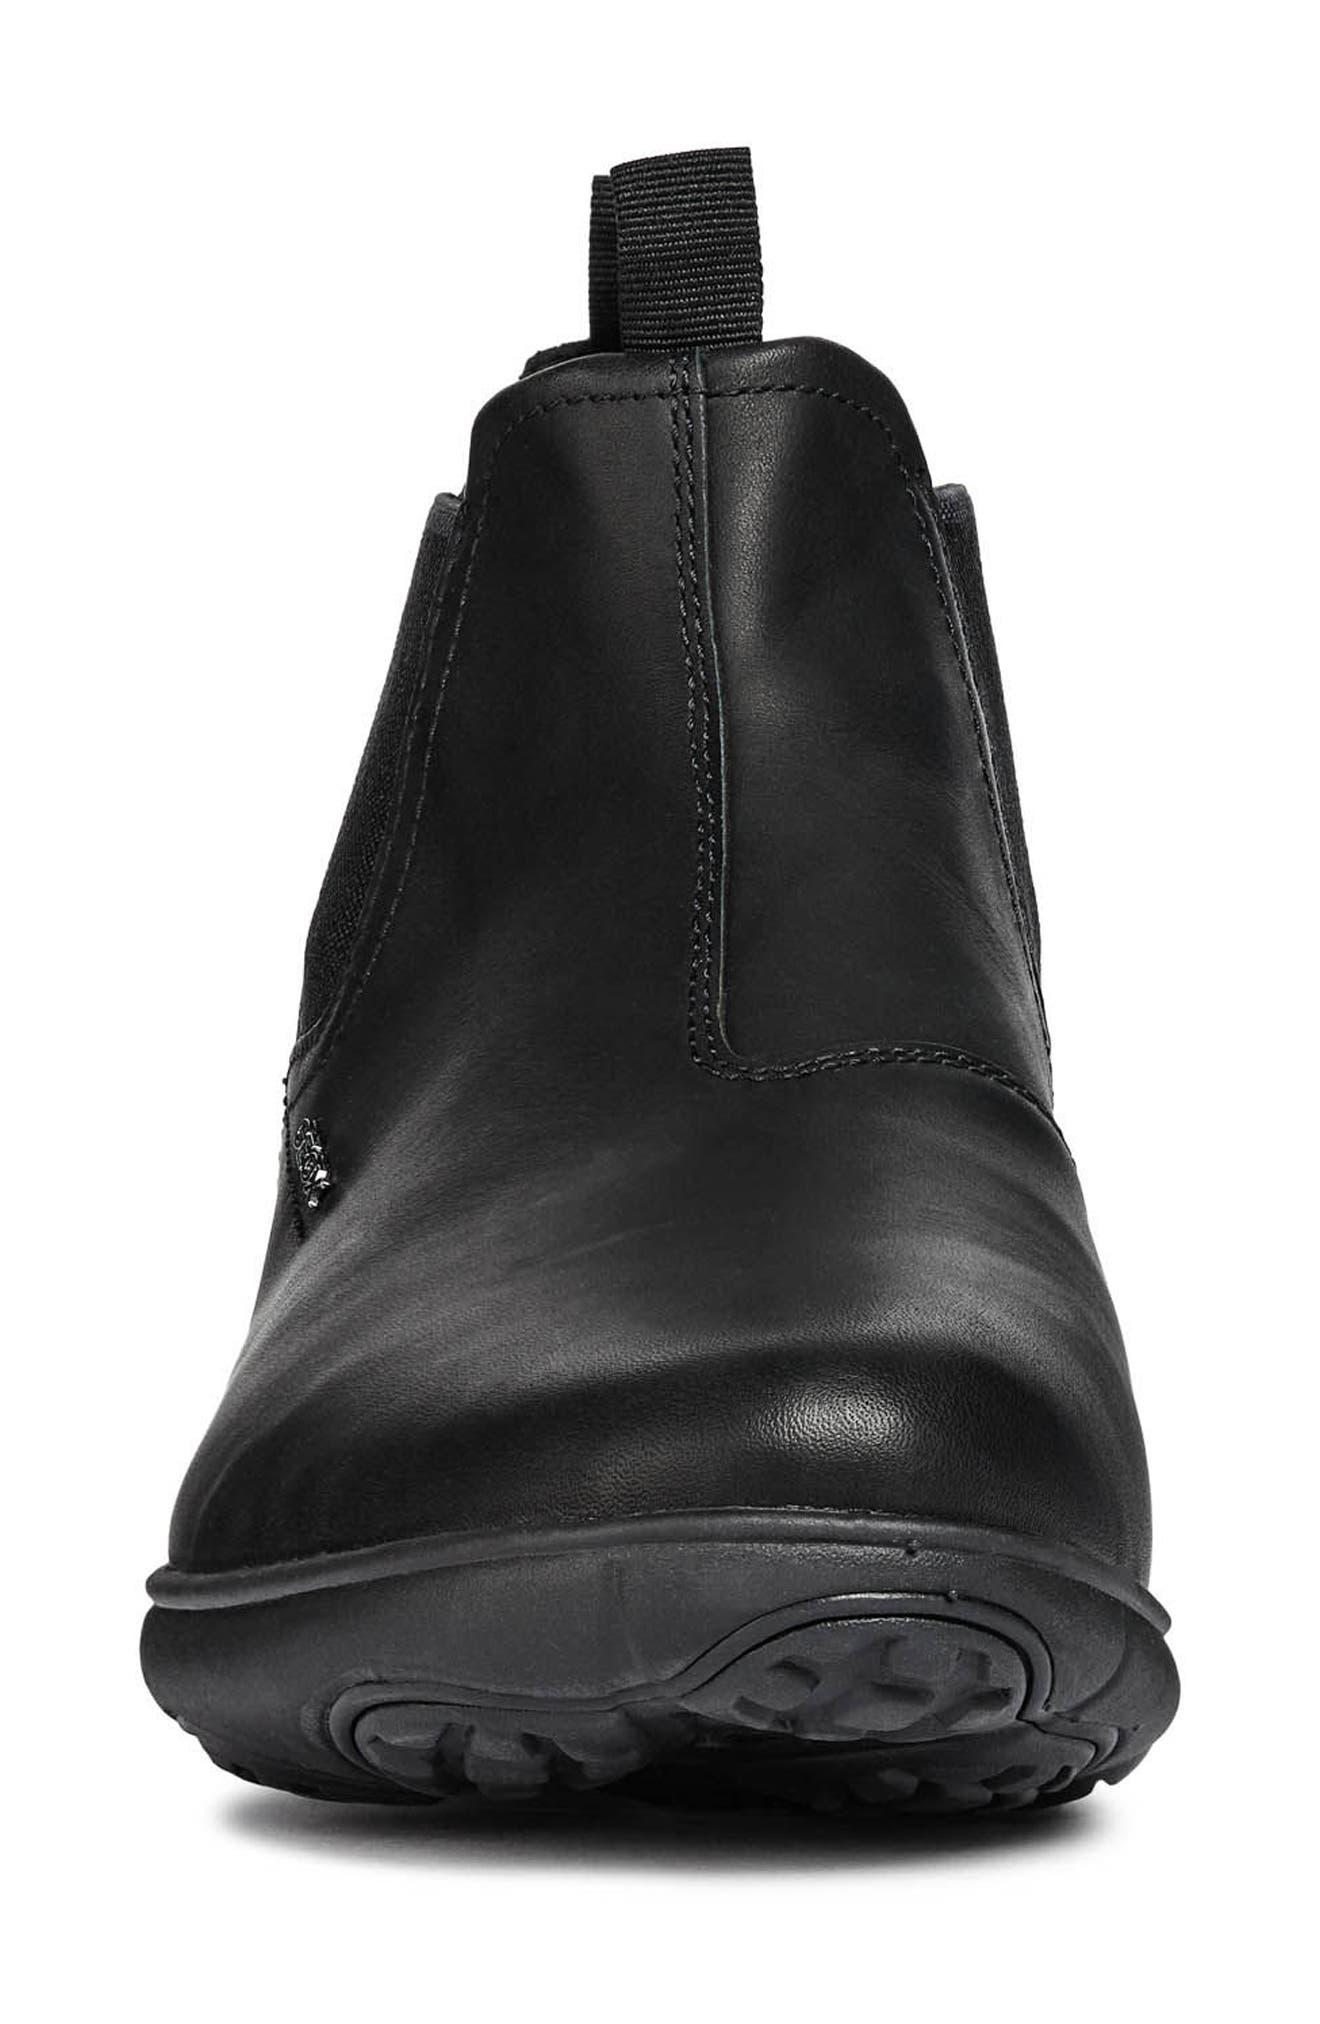 Nebula Mid Chelsea Sneaker,                             Alternate thumbnail 4, color,                             BLACK LEATHER